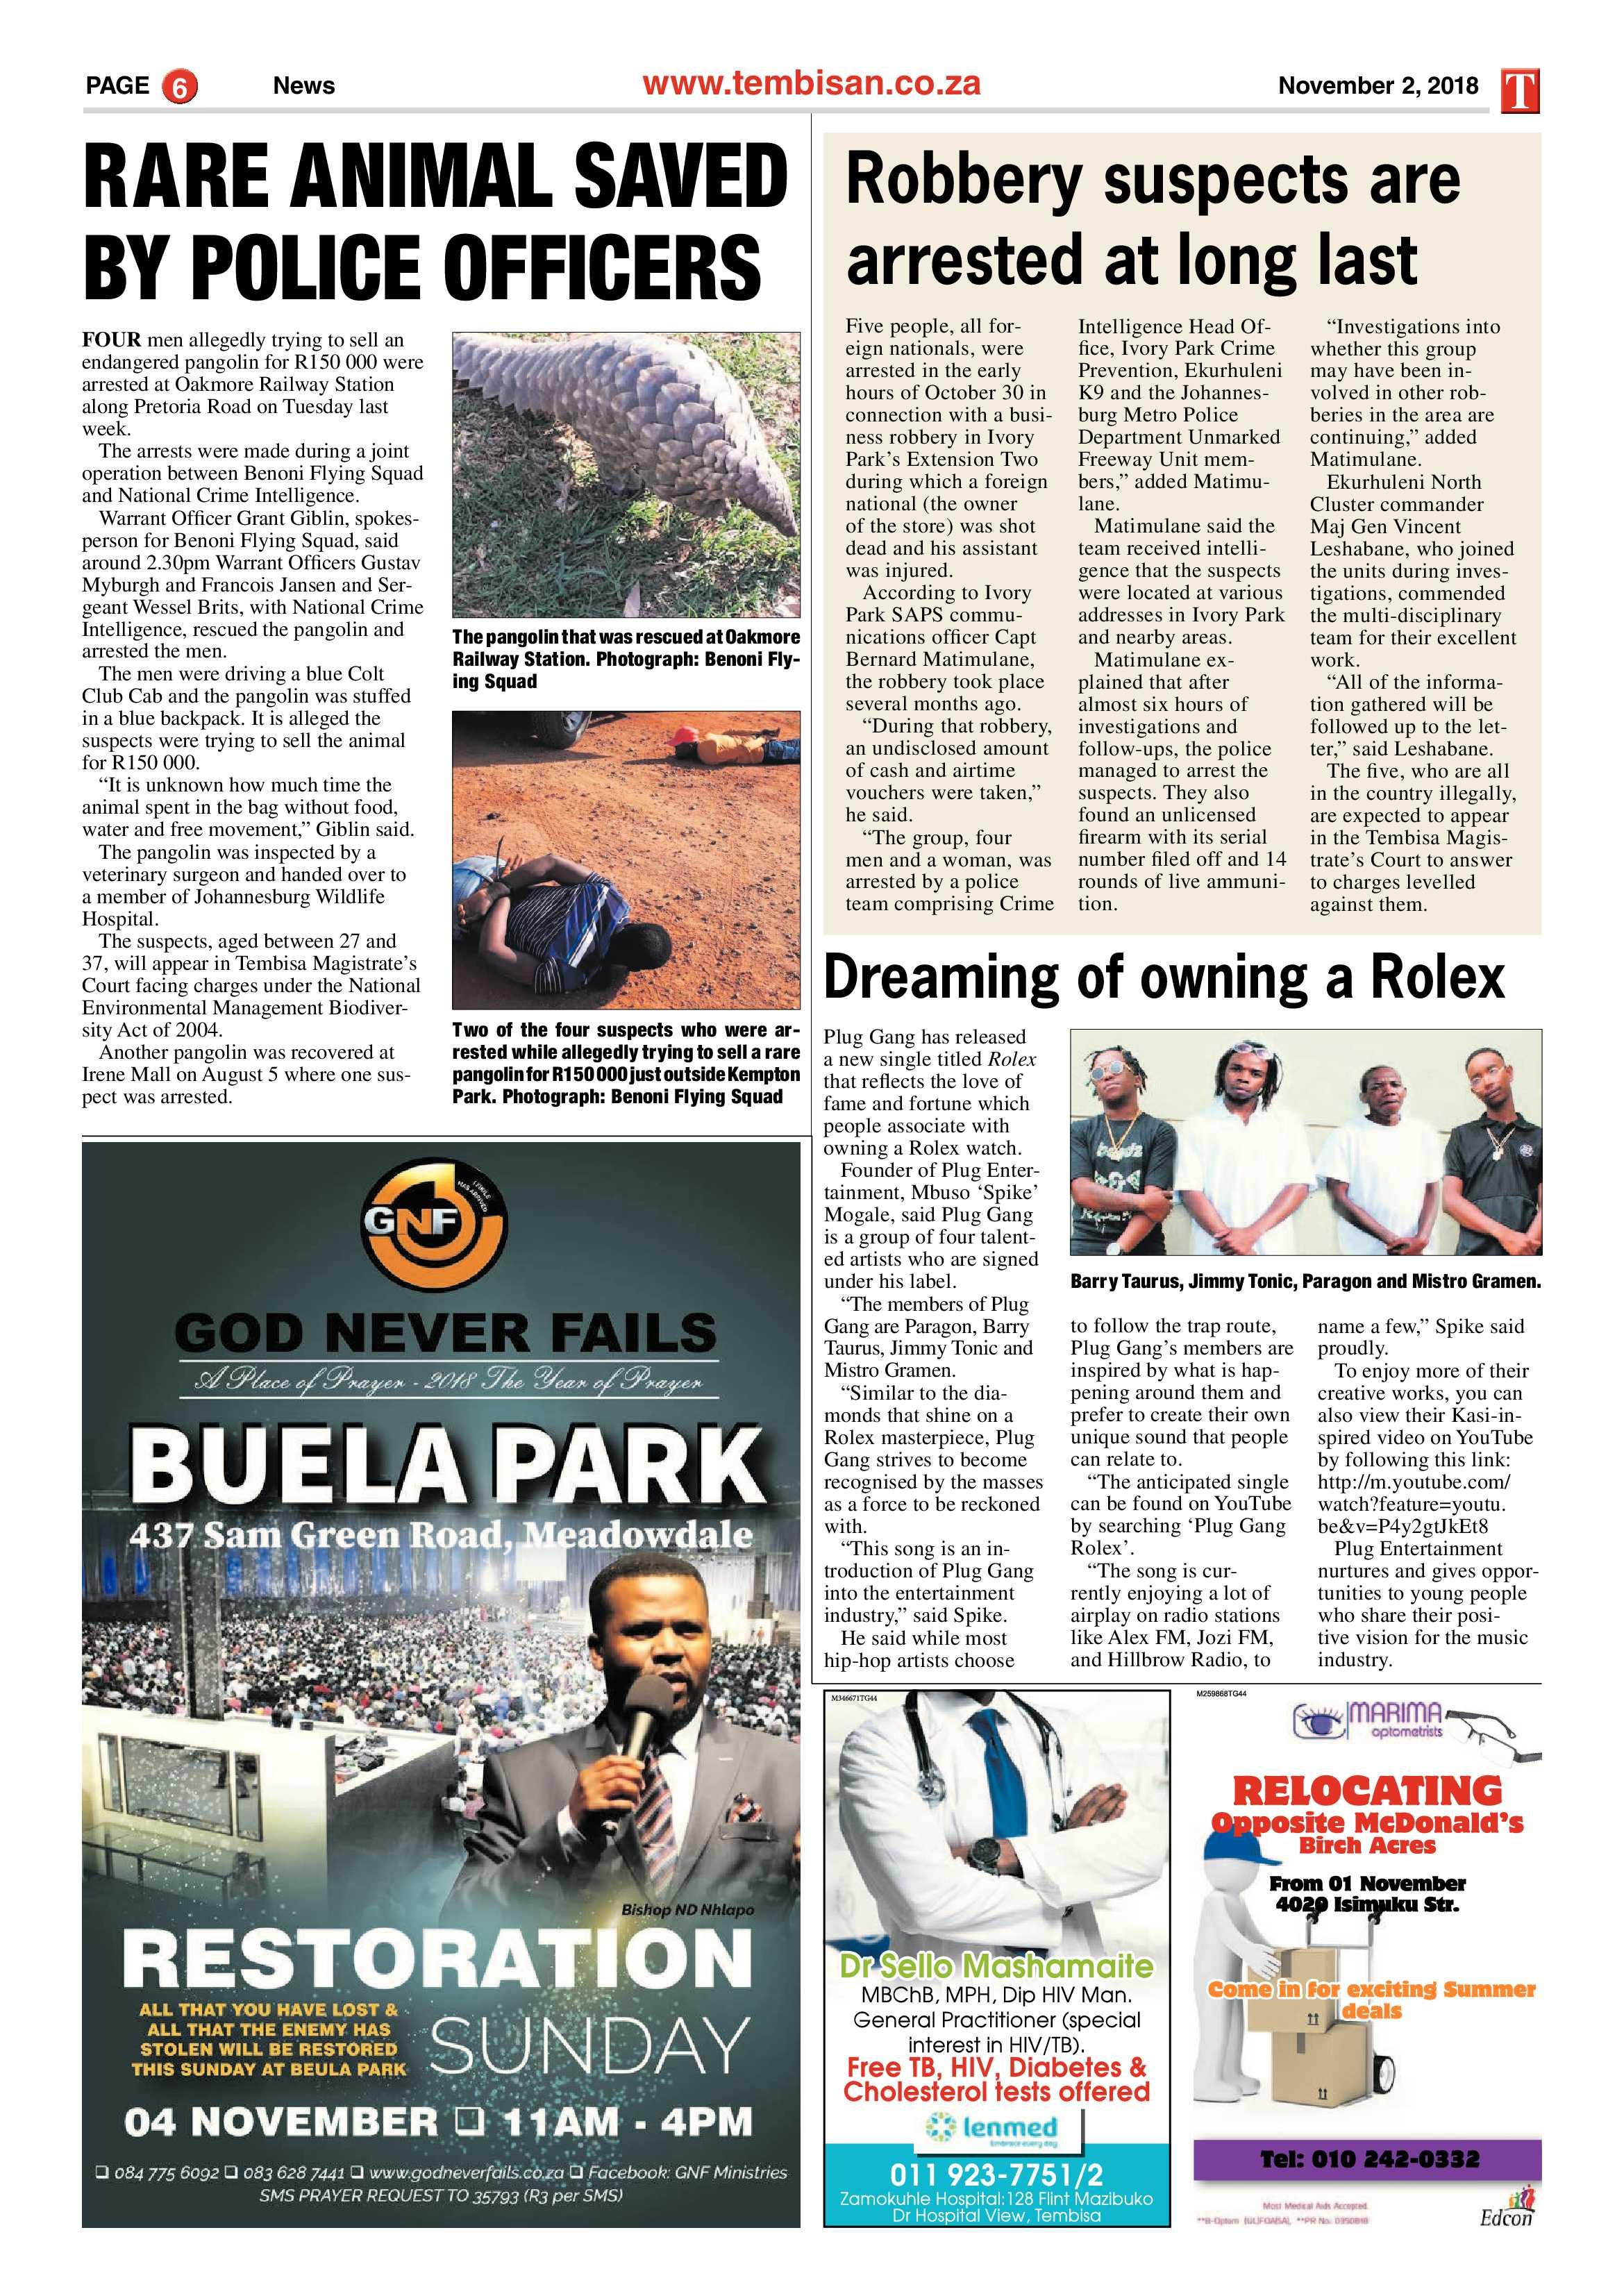 tembisan-02-november-2018-epapers-page-6